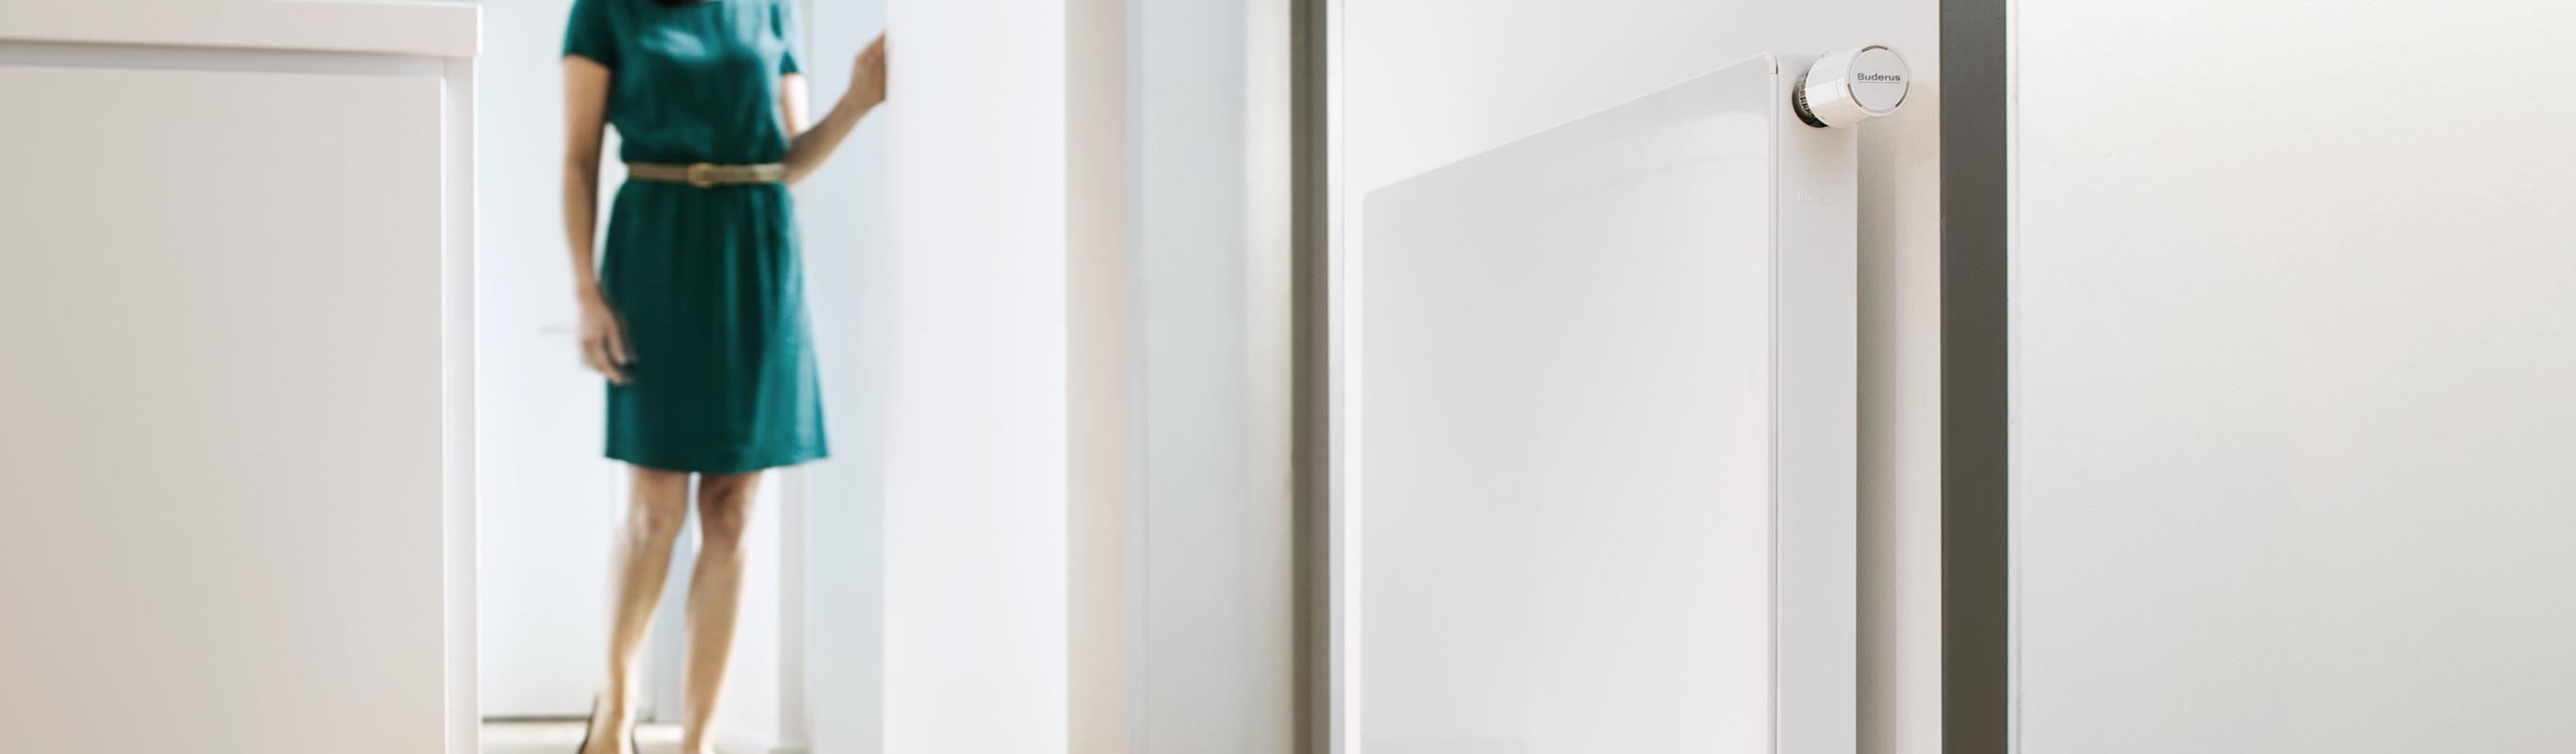 Flachheizkoerper in schoenem Design